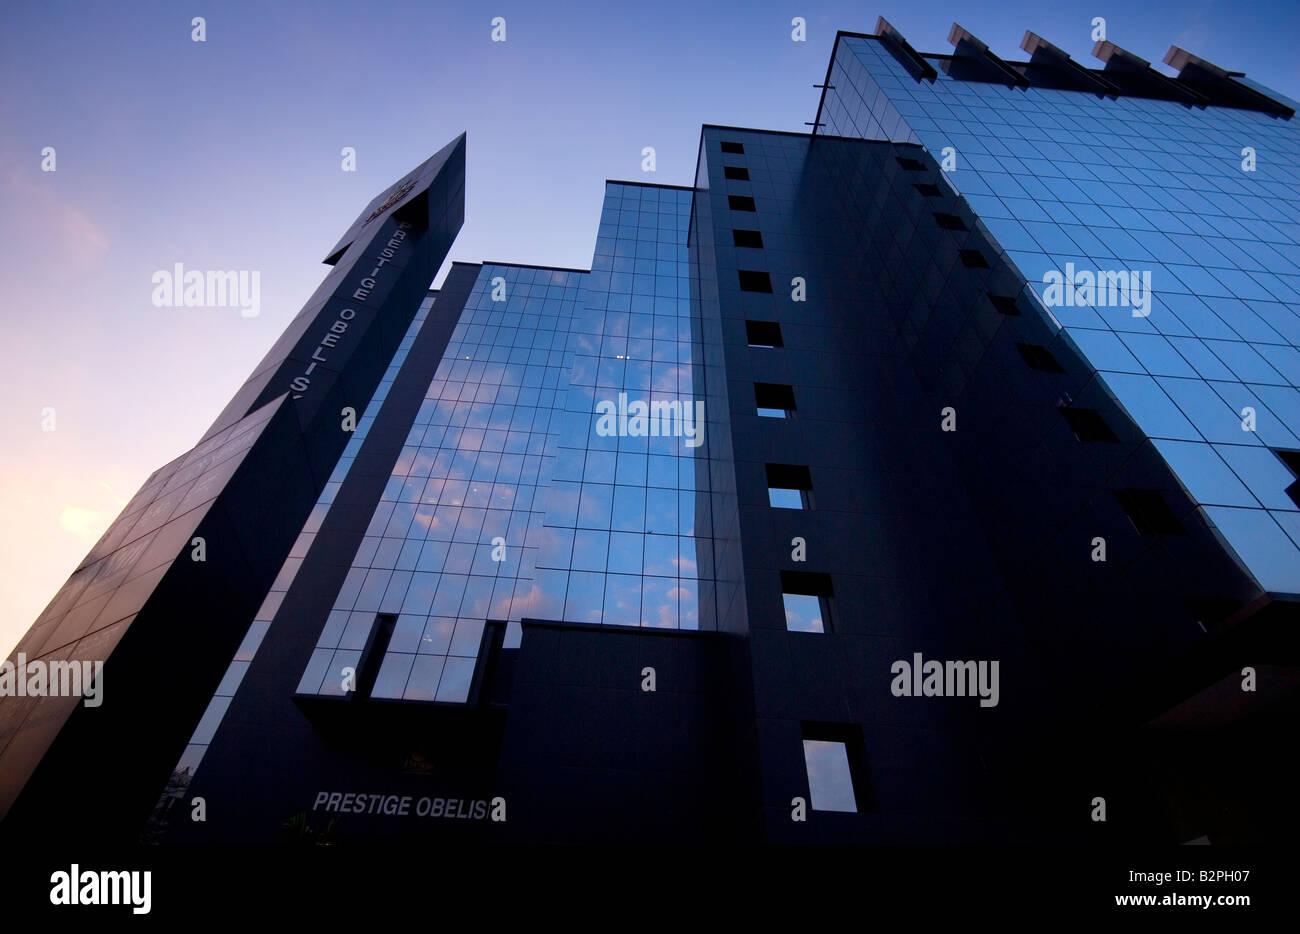 Moderne Gebäude, MG-Road-Bereich, Shanthala Nagar, Bengaluru (Bangalore), Karnataka, Südindien Stockbild